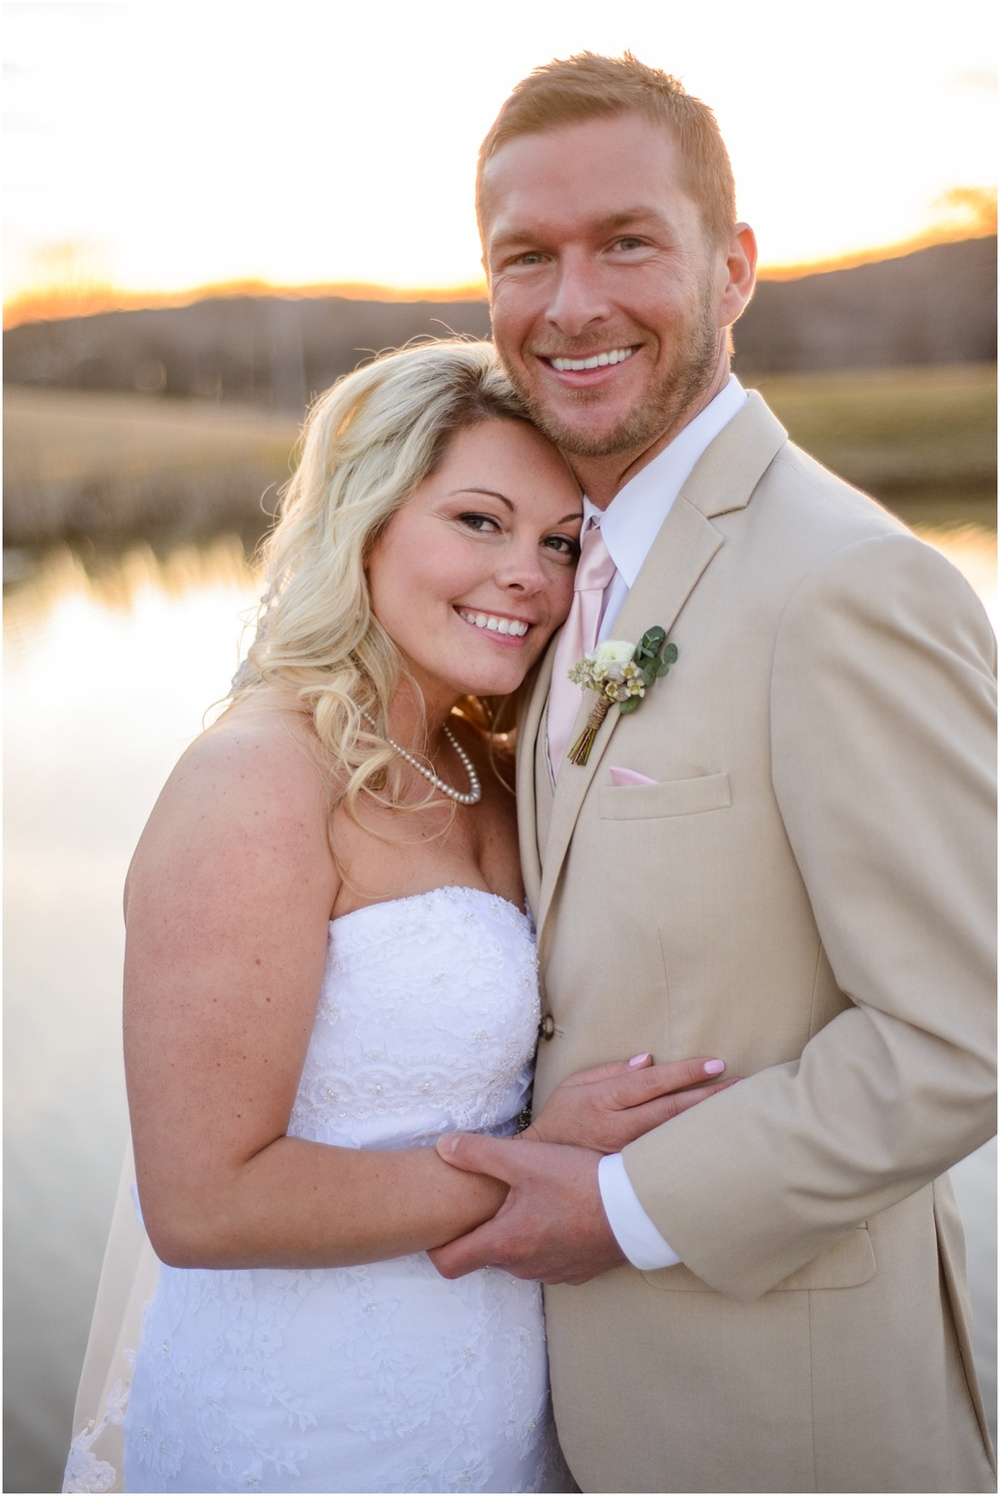 Greg Smit Photography Nashville wedding photographer Mint Springs Farm_0273